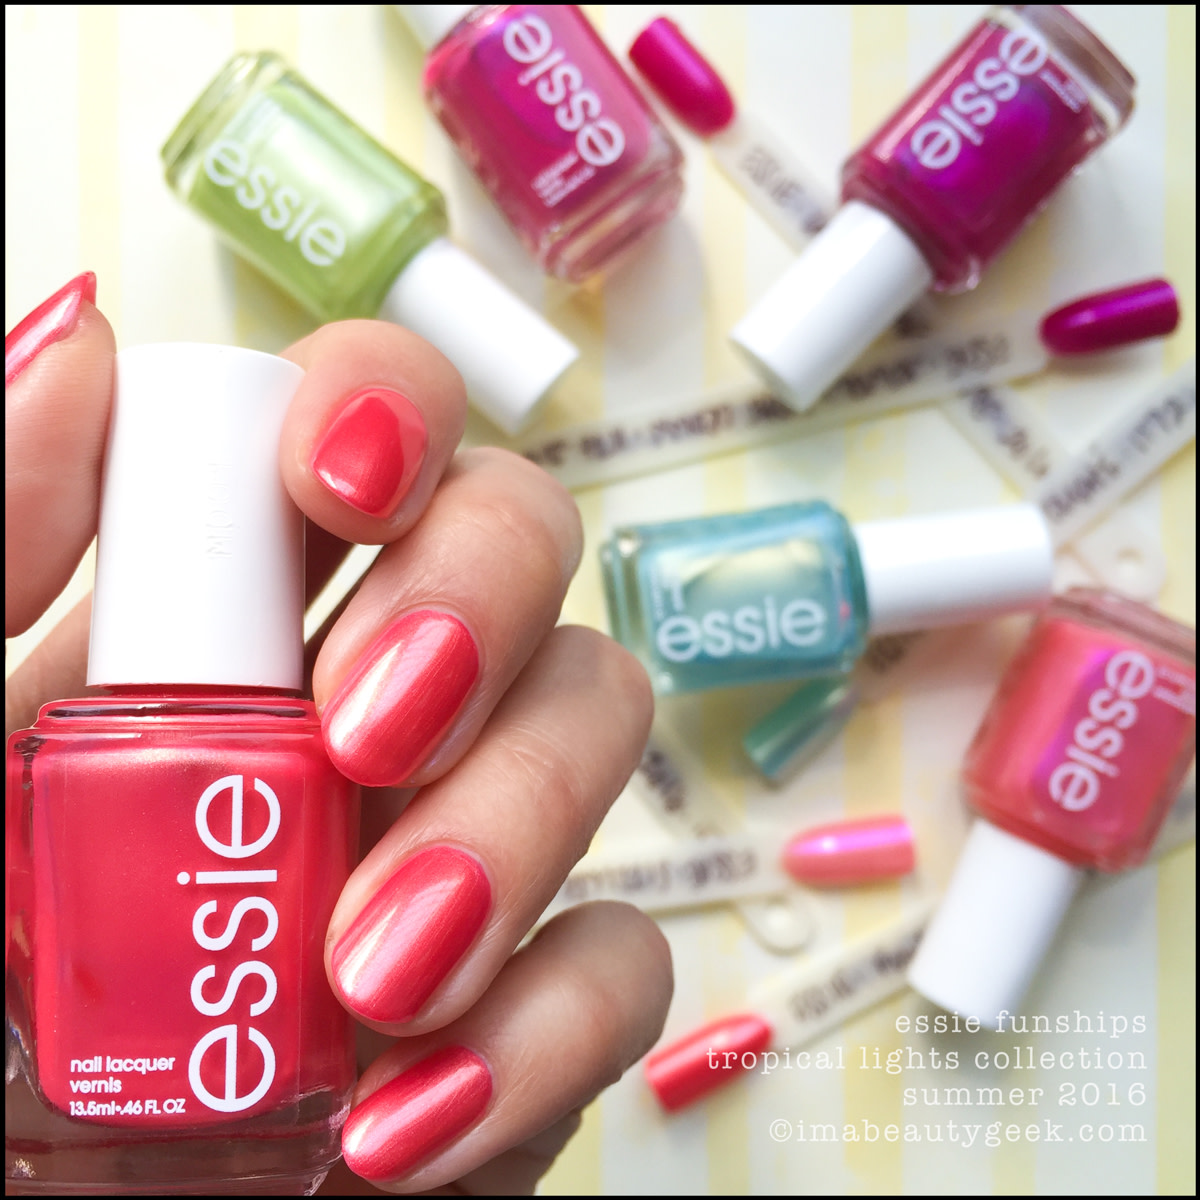 Essie Funships_Essie Tropical Lights Summer 2016 Collection